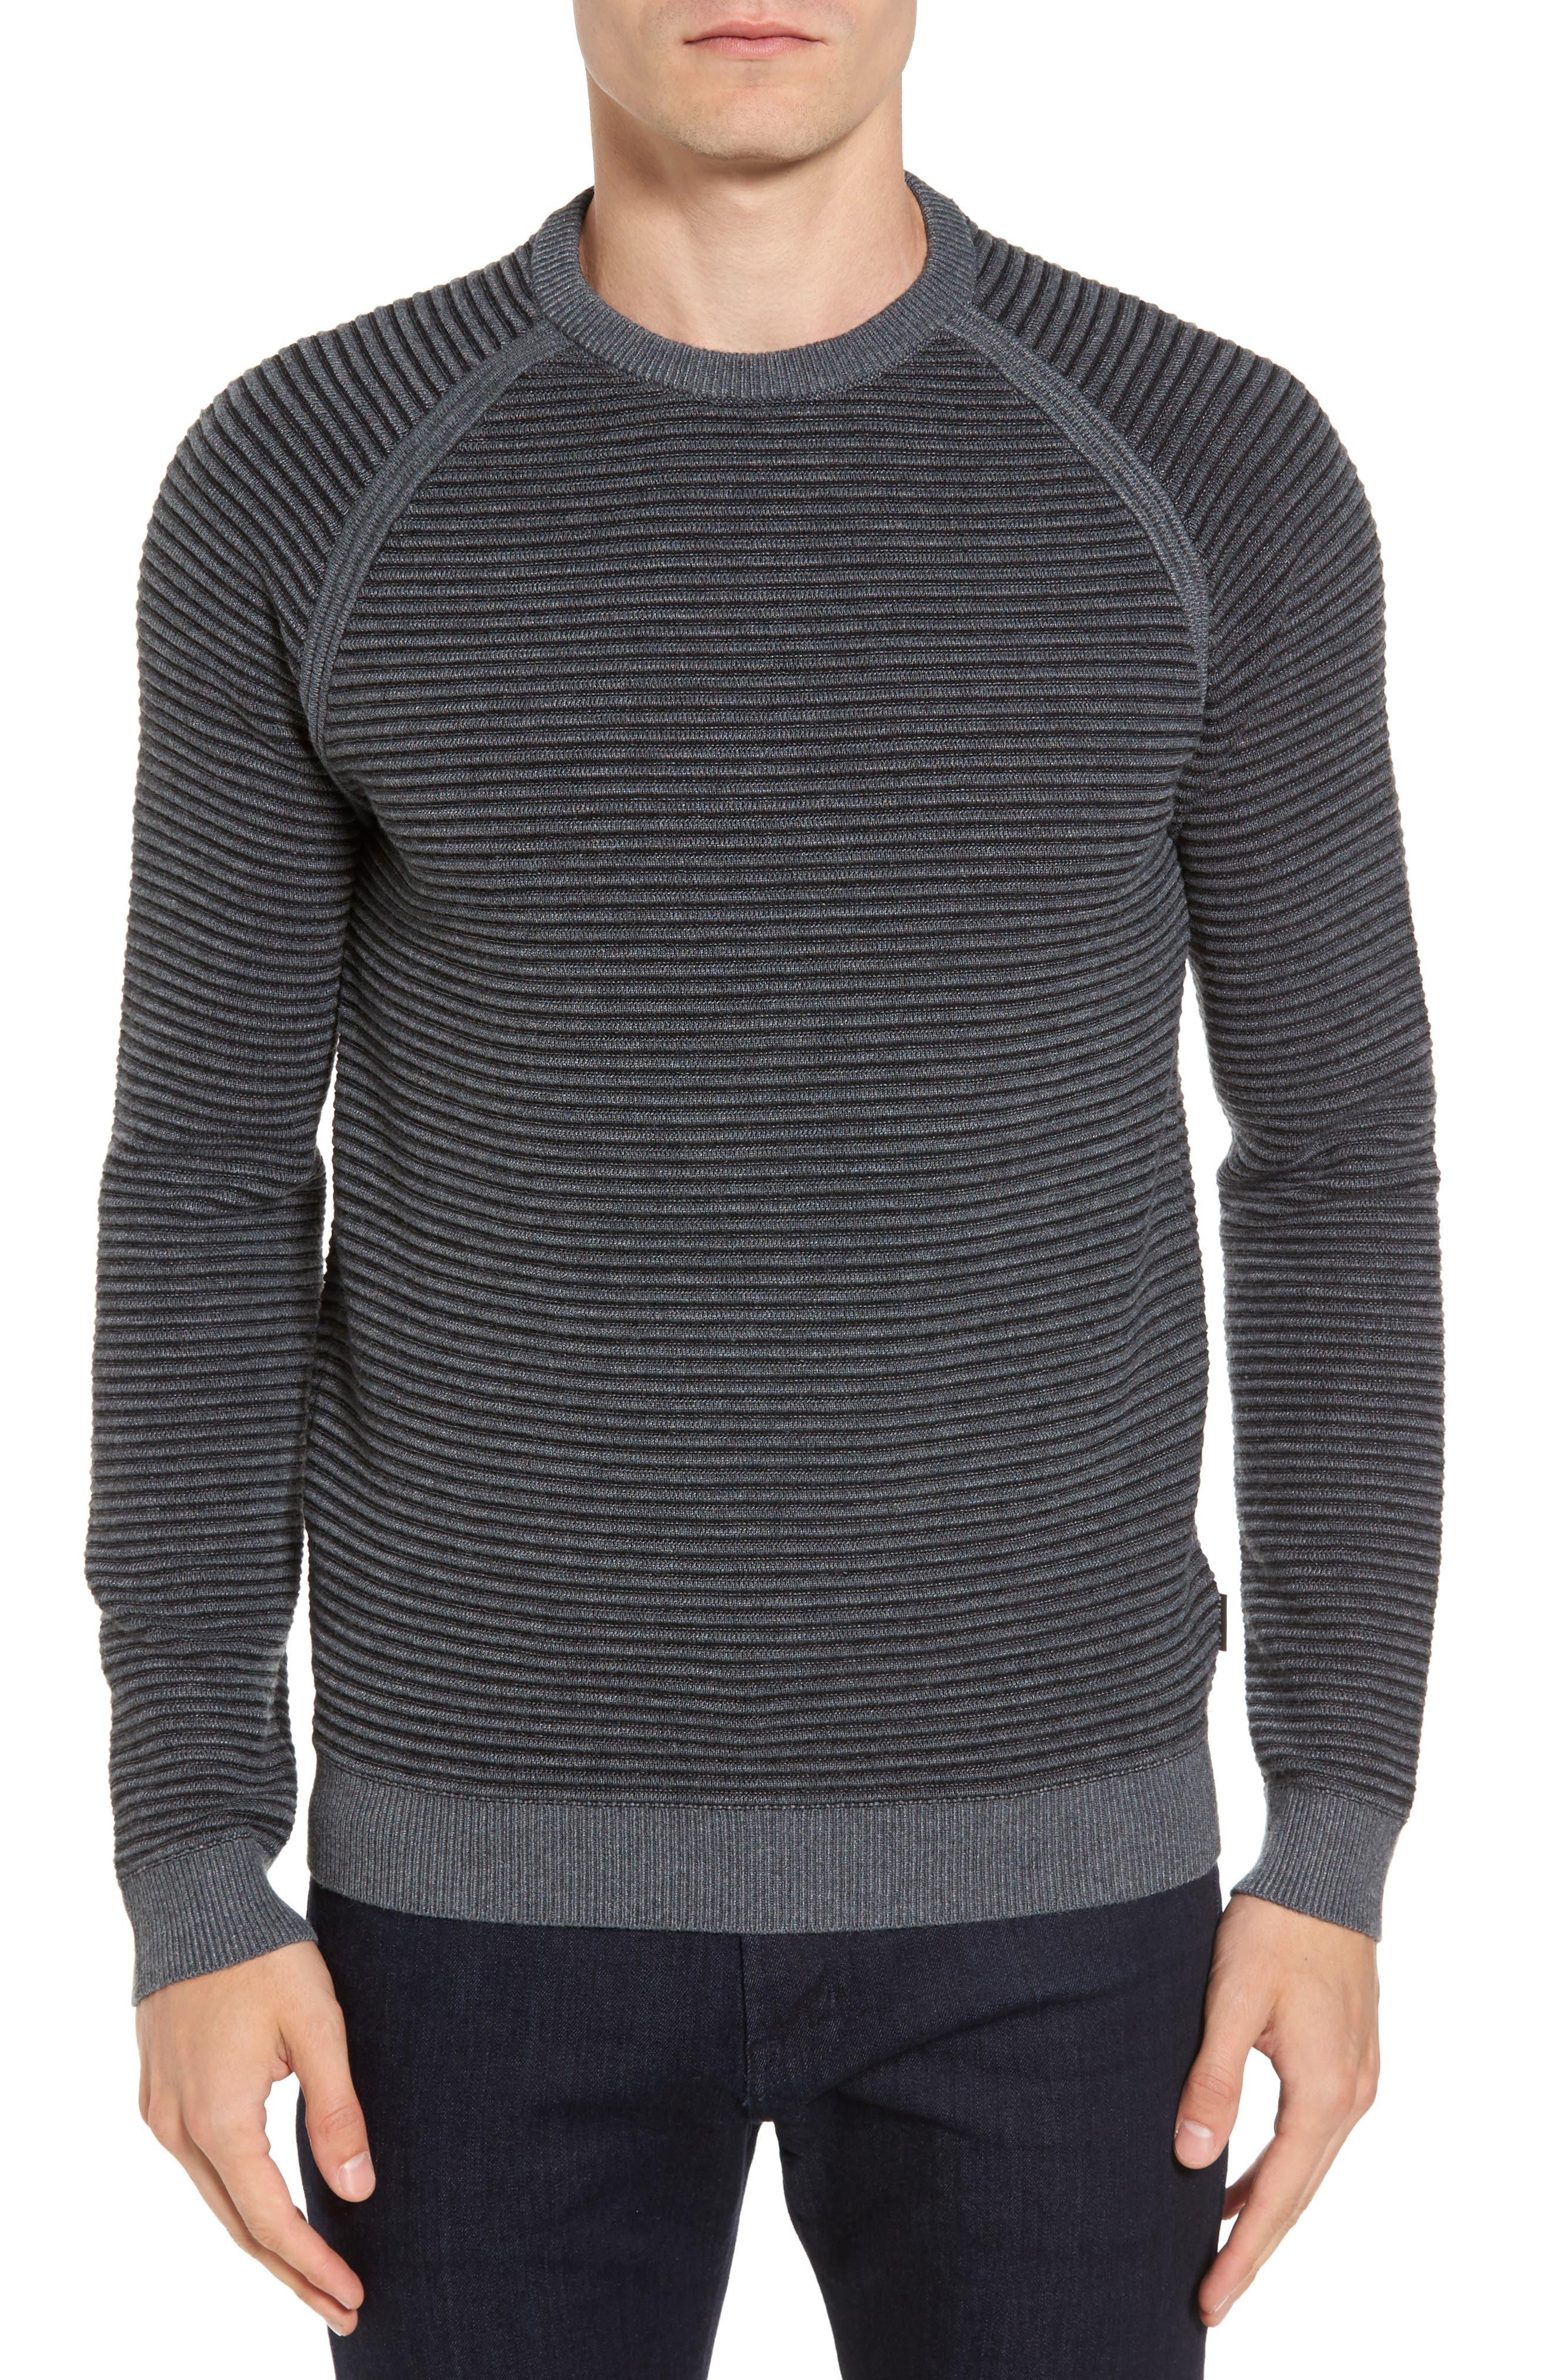 Cashoo Slim Fit Ribbed Sweatshirt,                         Main,                         color, 030